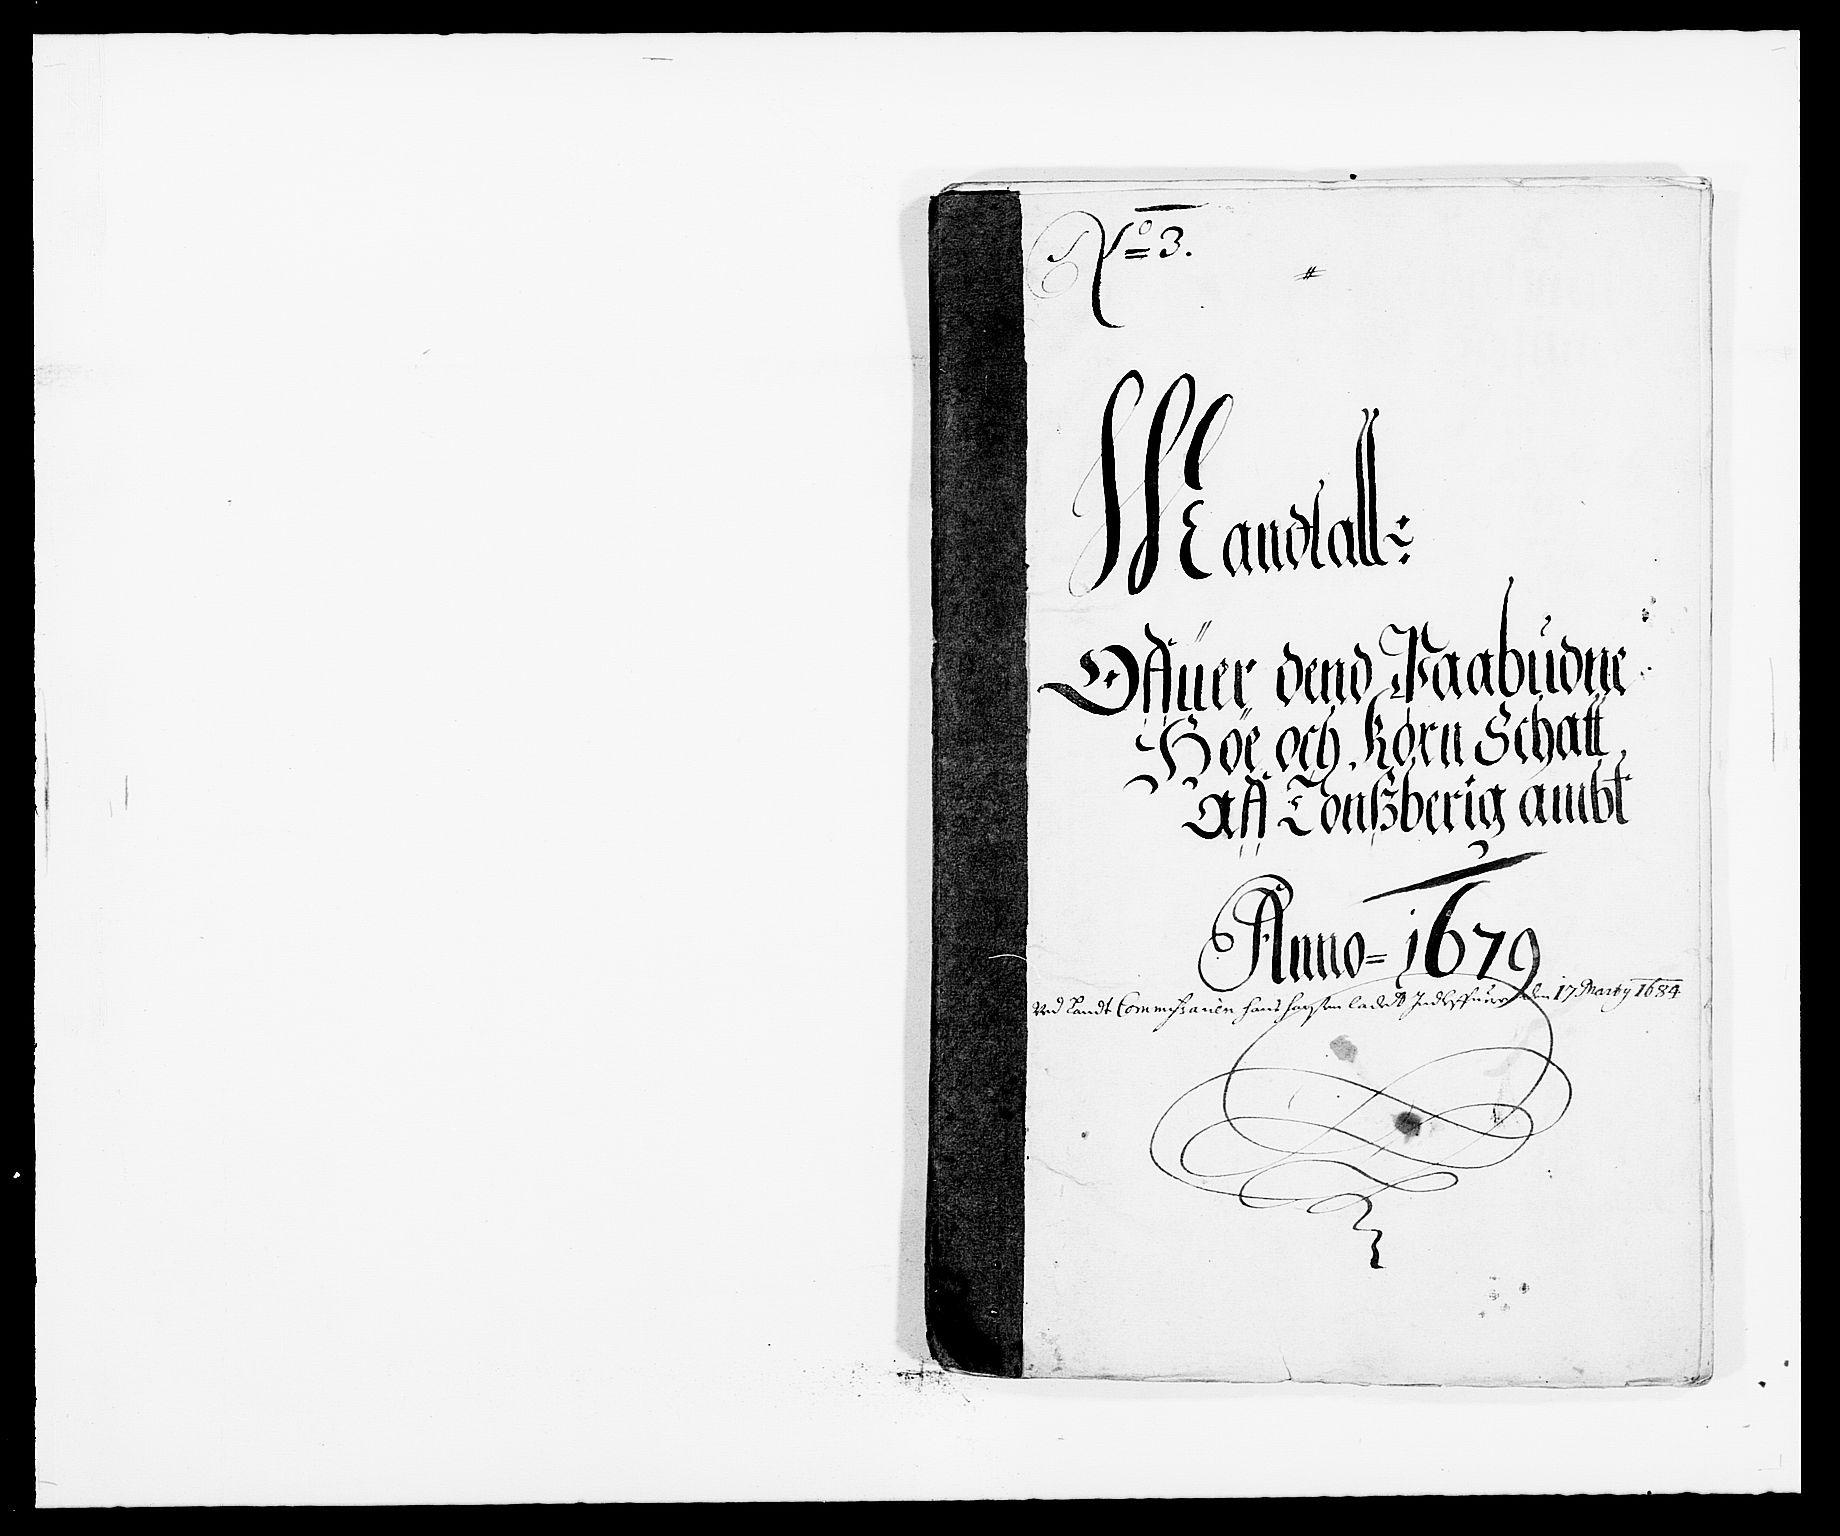 RA, Rentekammeret inntil 1814, Reviderte regnskaper, Fogderegnskap, R32/L1846: Fogderegnskap Jarlsberg grevskap, 1679-1680, s. 249